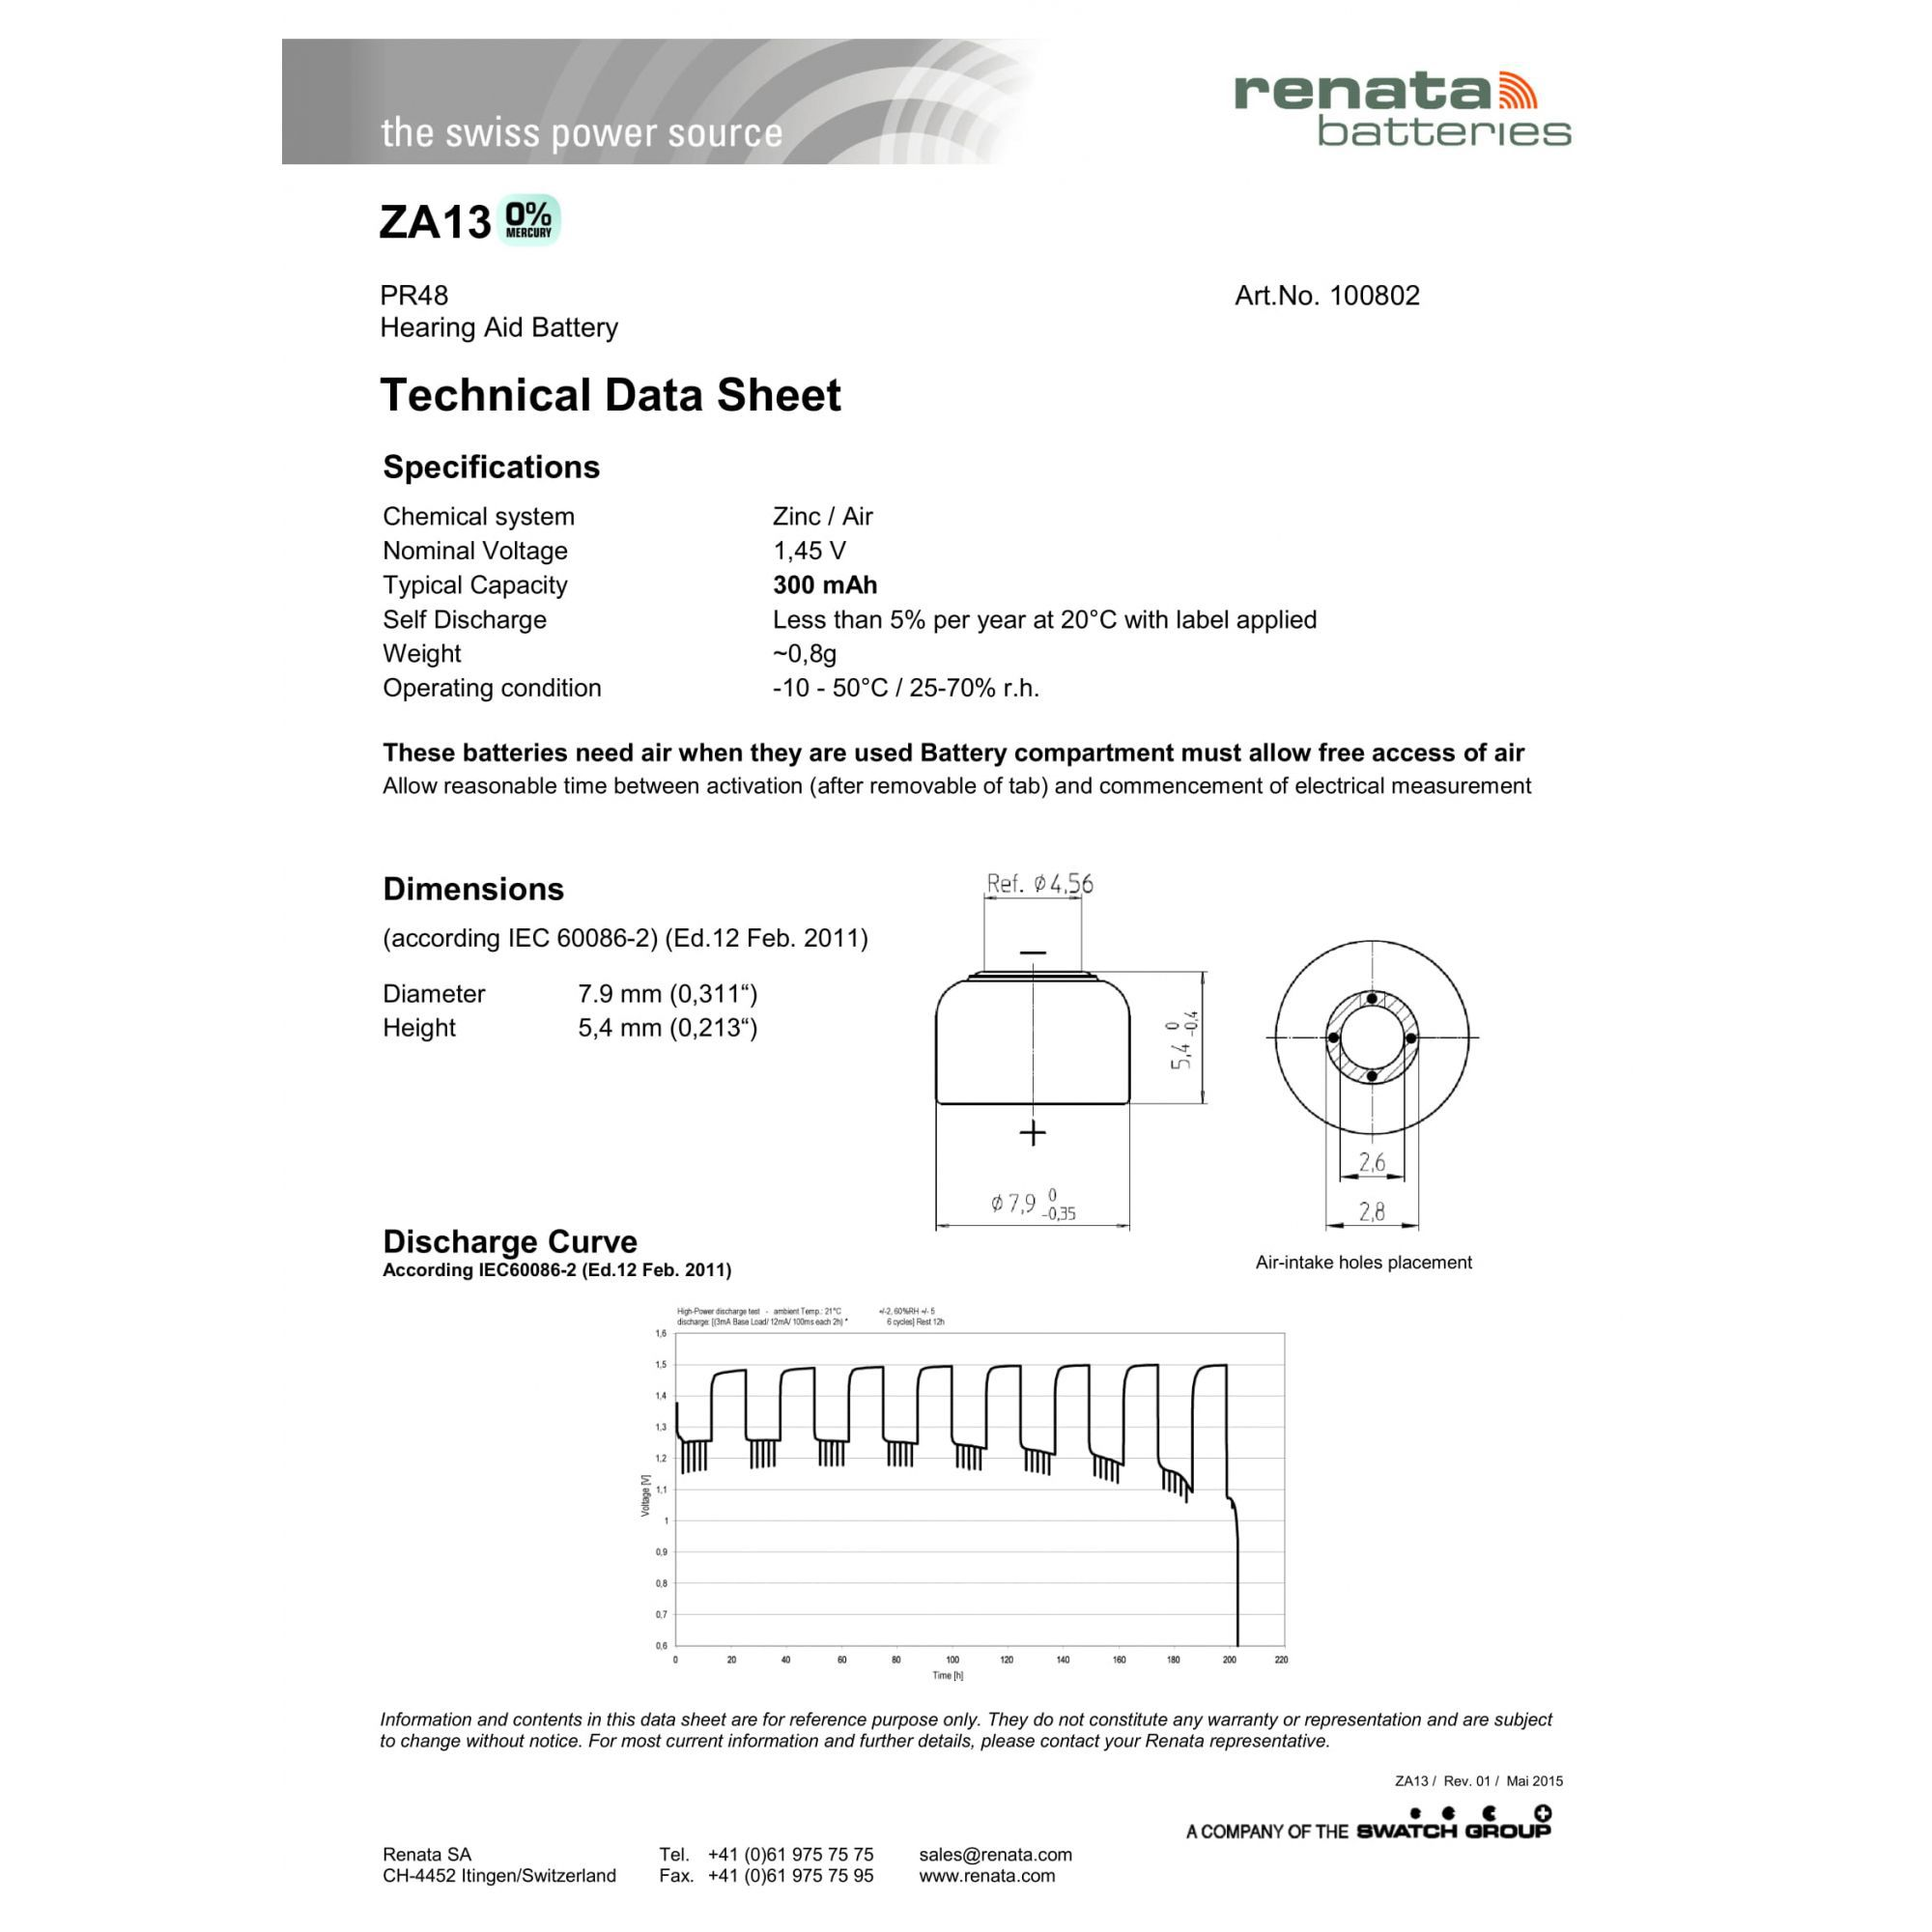 120 Baterias Pilhas Auditiva 13 RENATA ZA13  - 20 cartelas